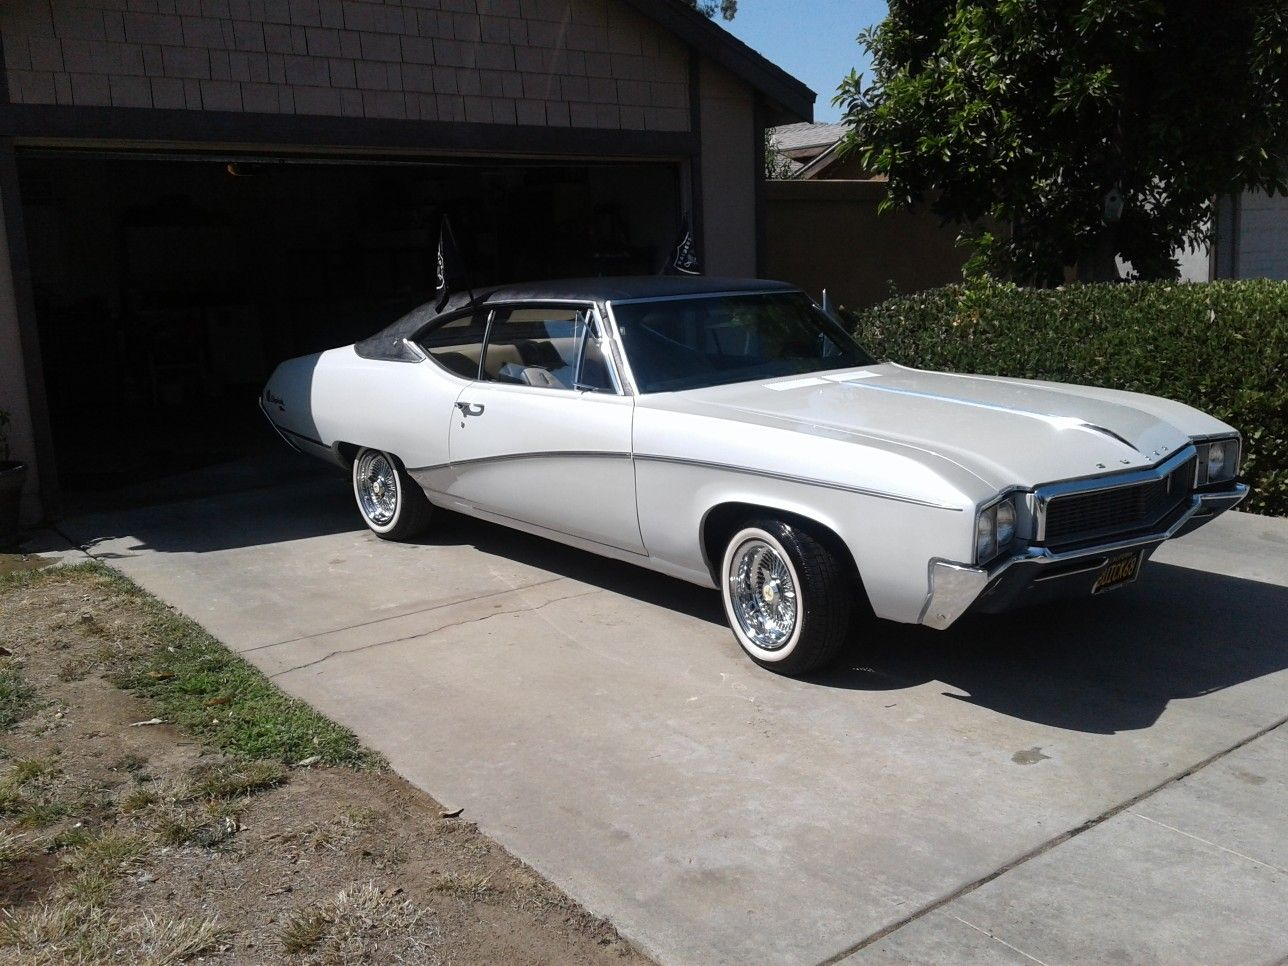 1968 Skylark Lowrider Buick Cars Buick Skylark Buick